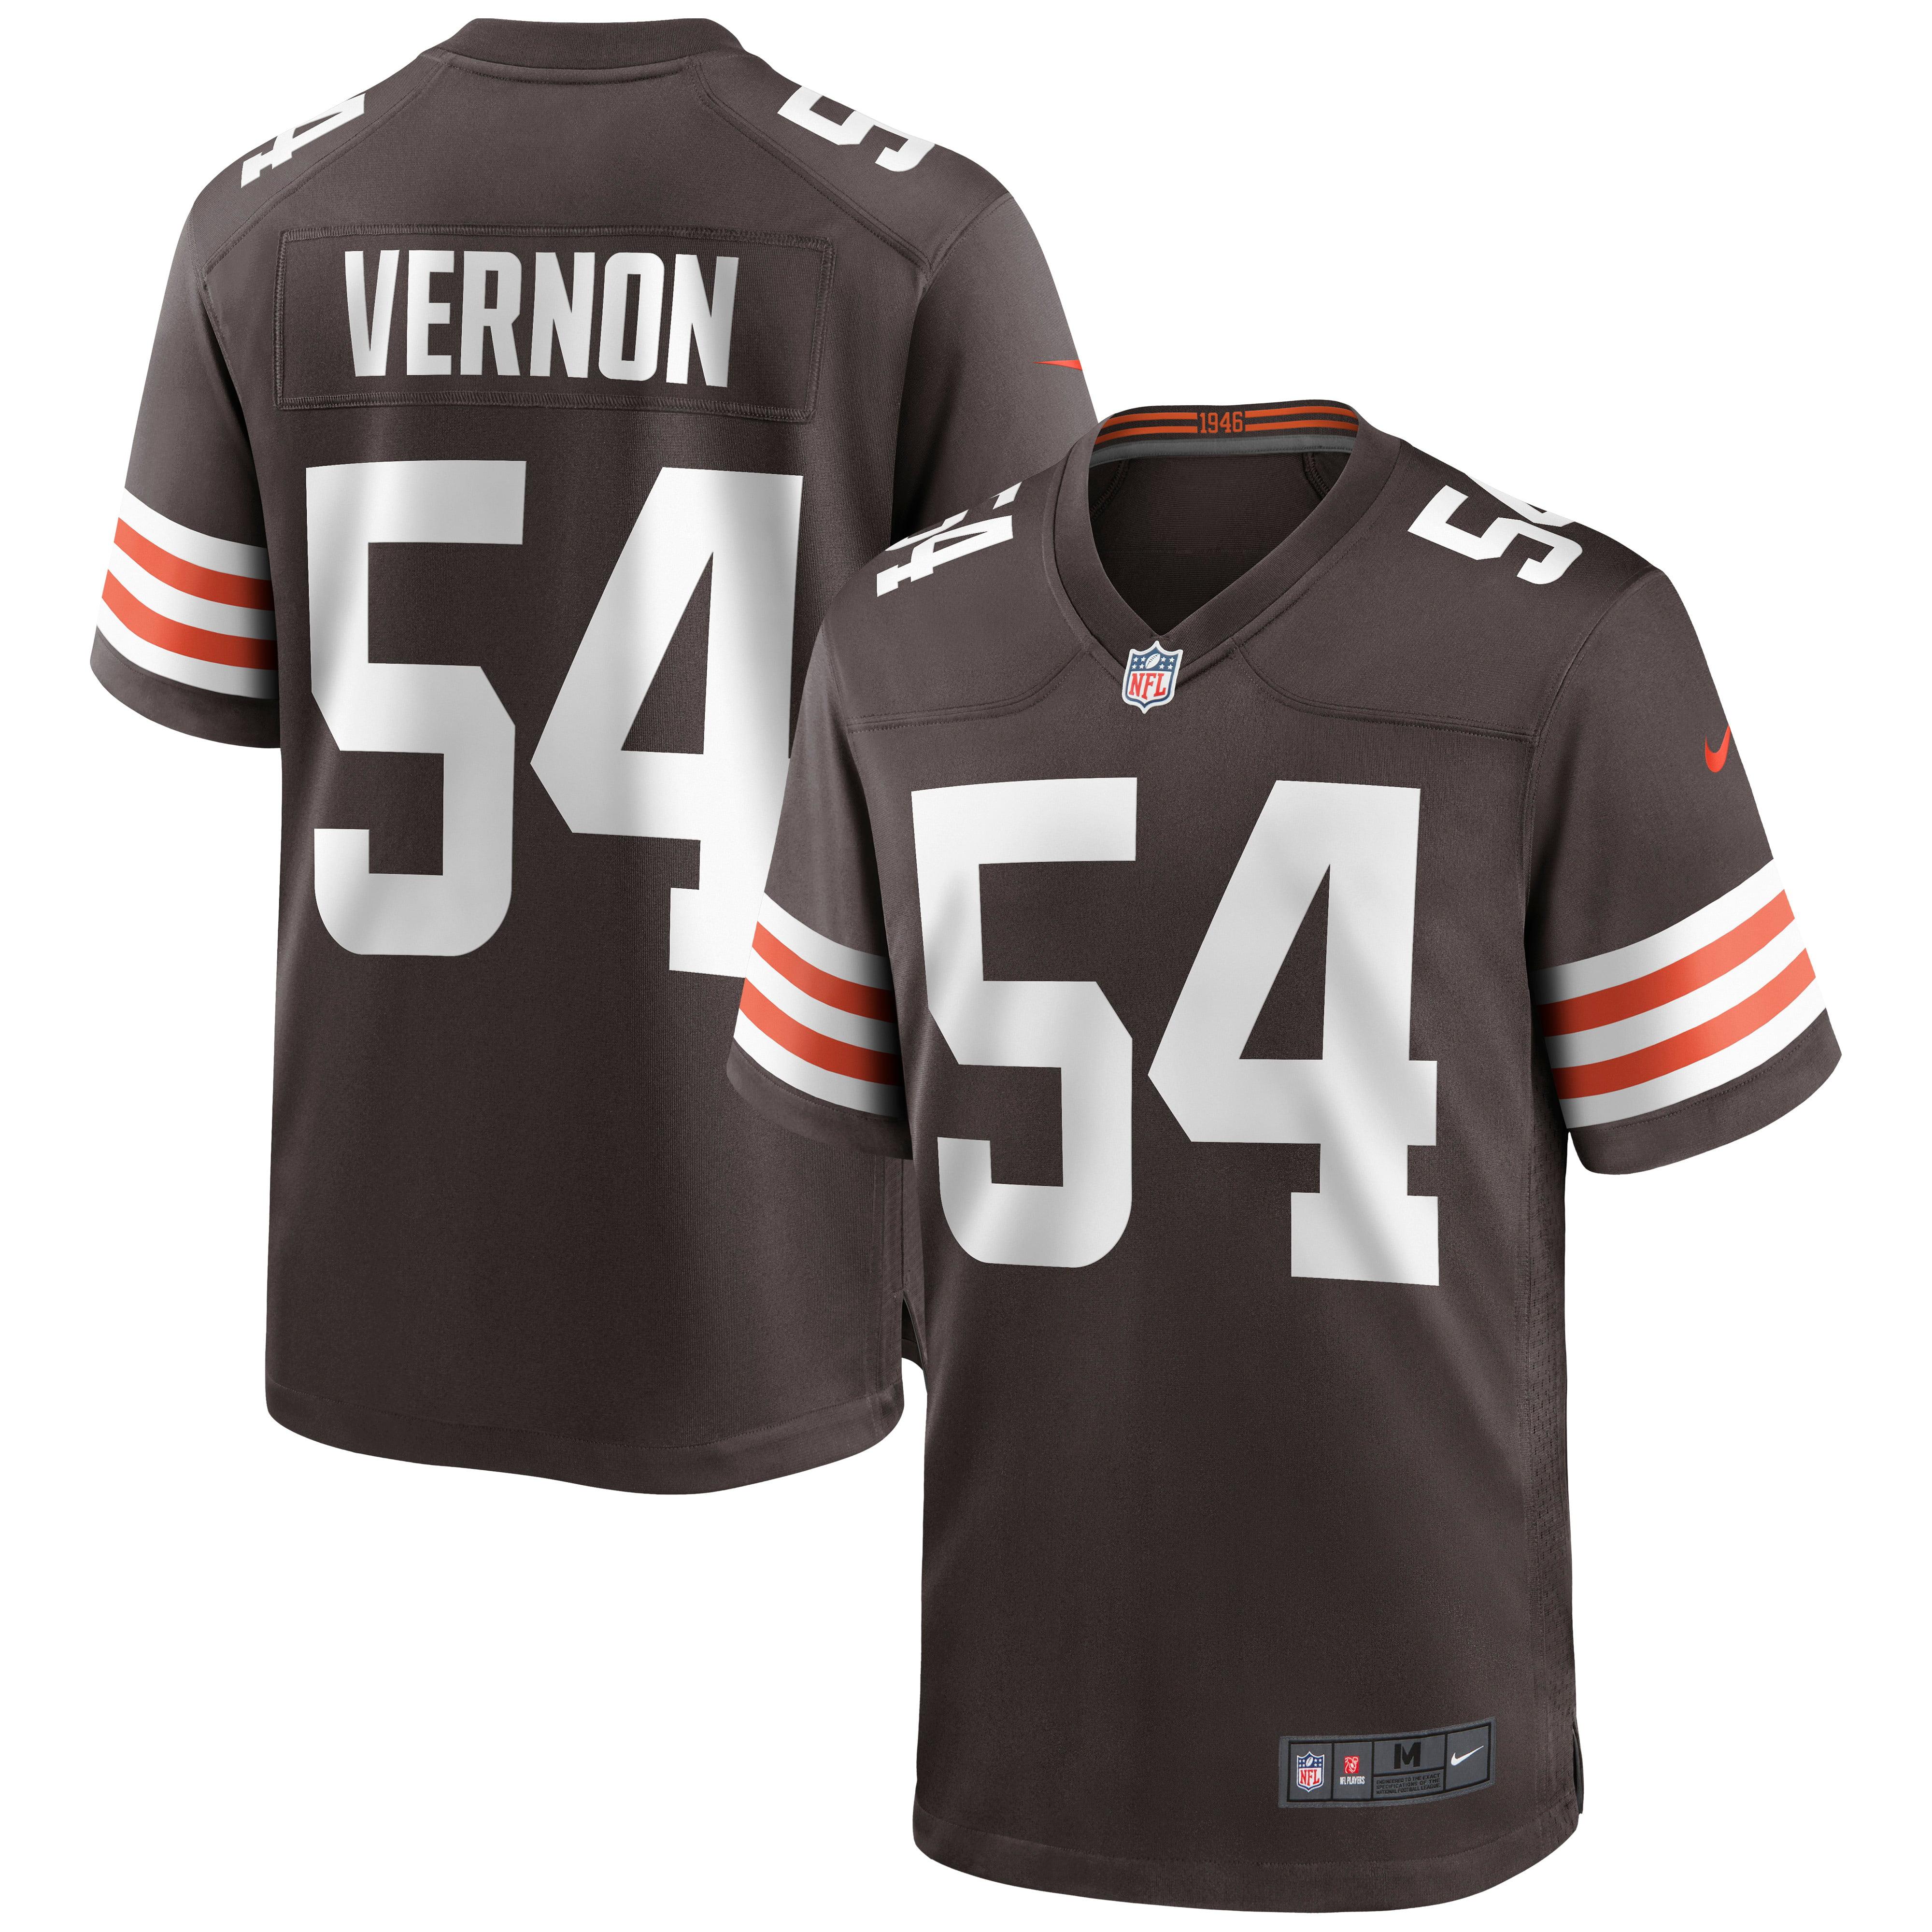 Olivier Vernon Cleveland Browns Nike Game Jersey - Brown - Walmart.com